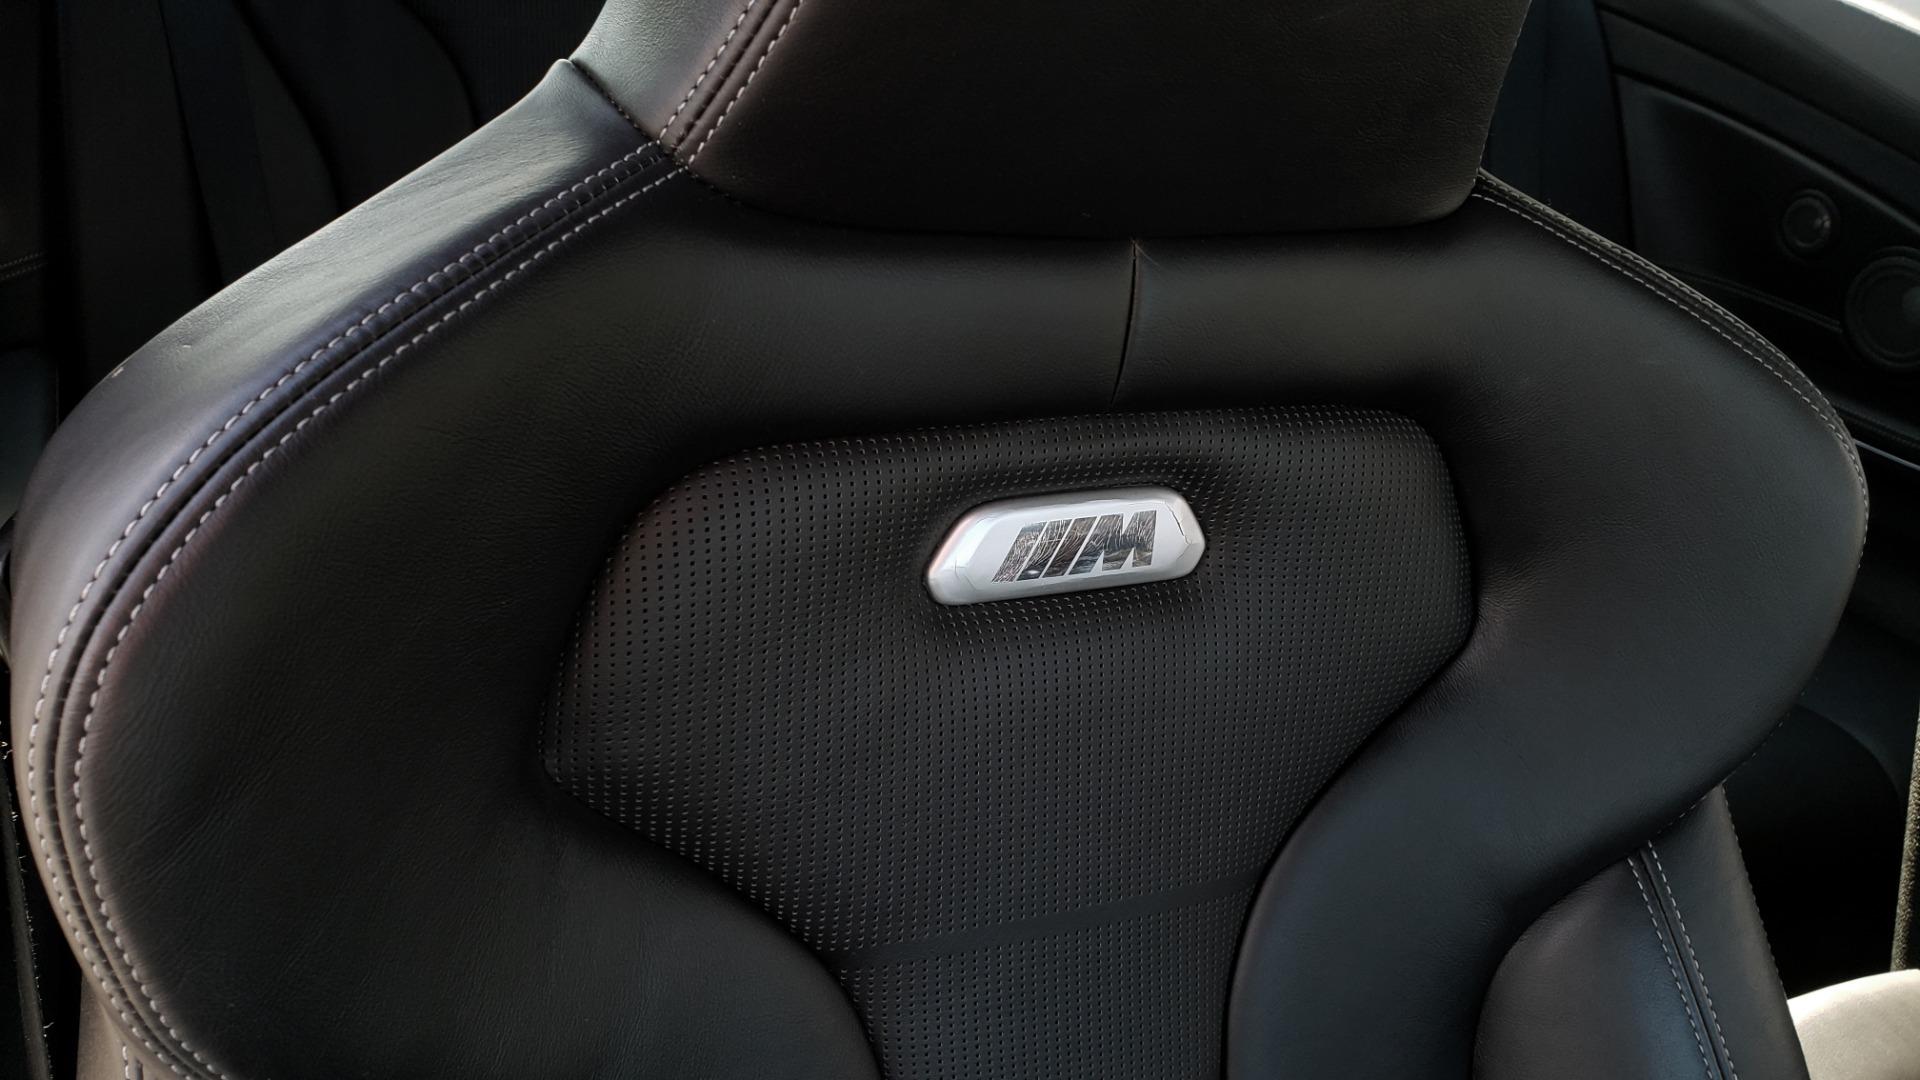 Used 2015 BMW M4 COUPE / EXEC PKG / DRVR ASST PLUS / LIGHTING / M-SUSPENSION for sale Sold at Formula Imports in Charlotte NC 28227 77